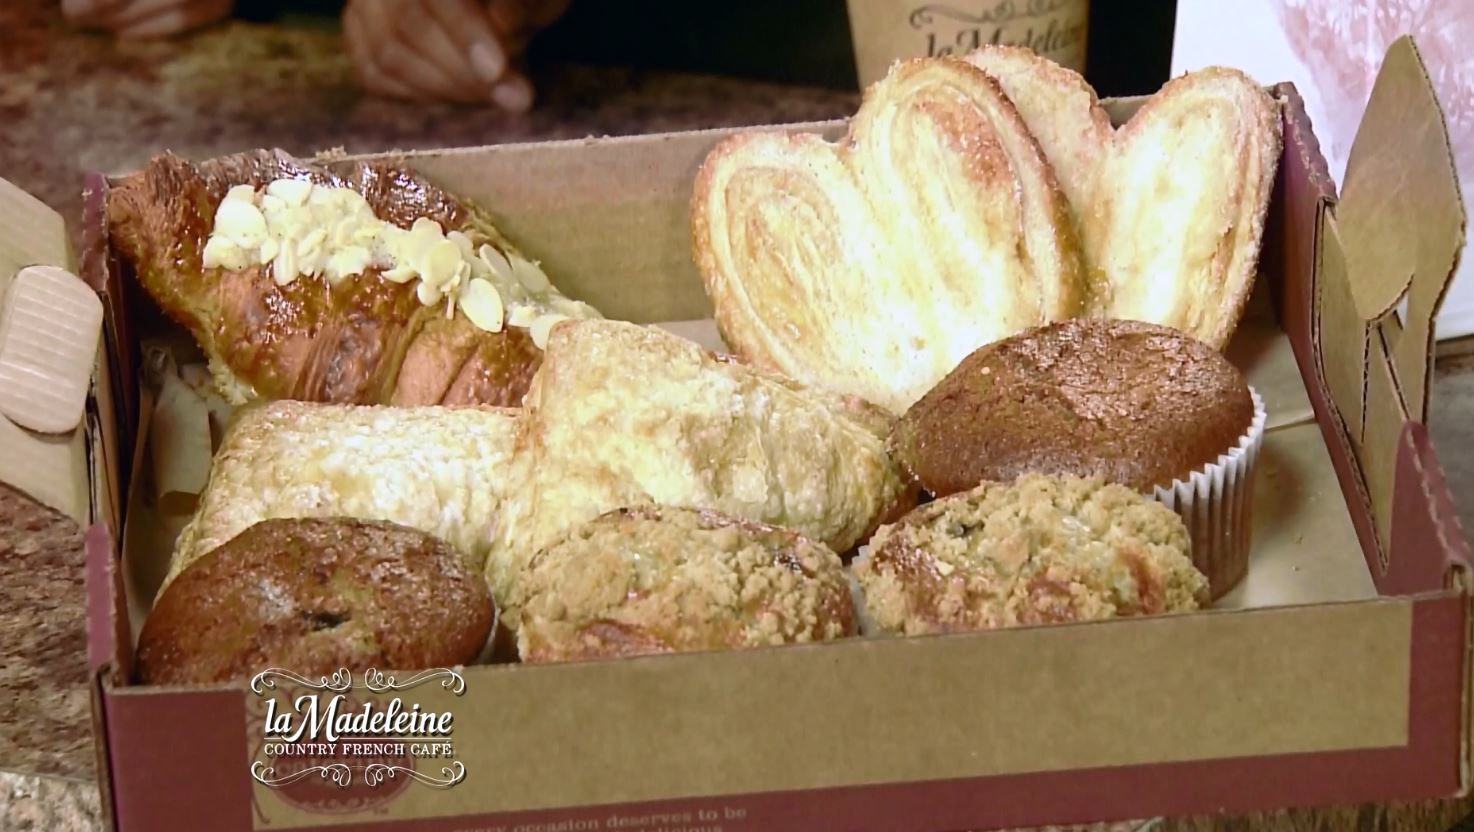 Croissants at La Madeleine